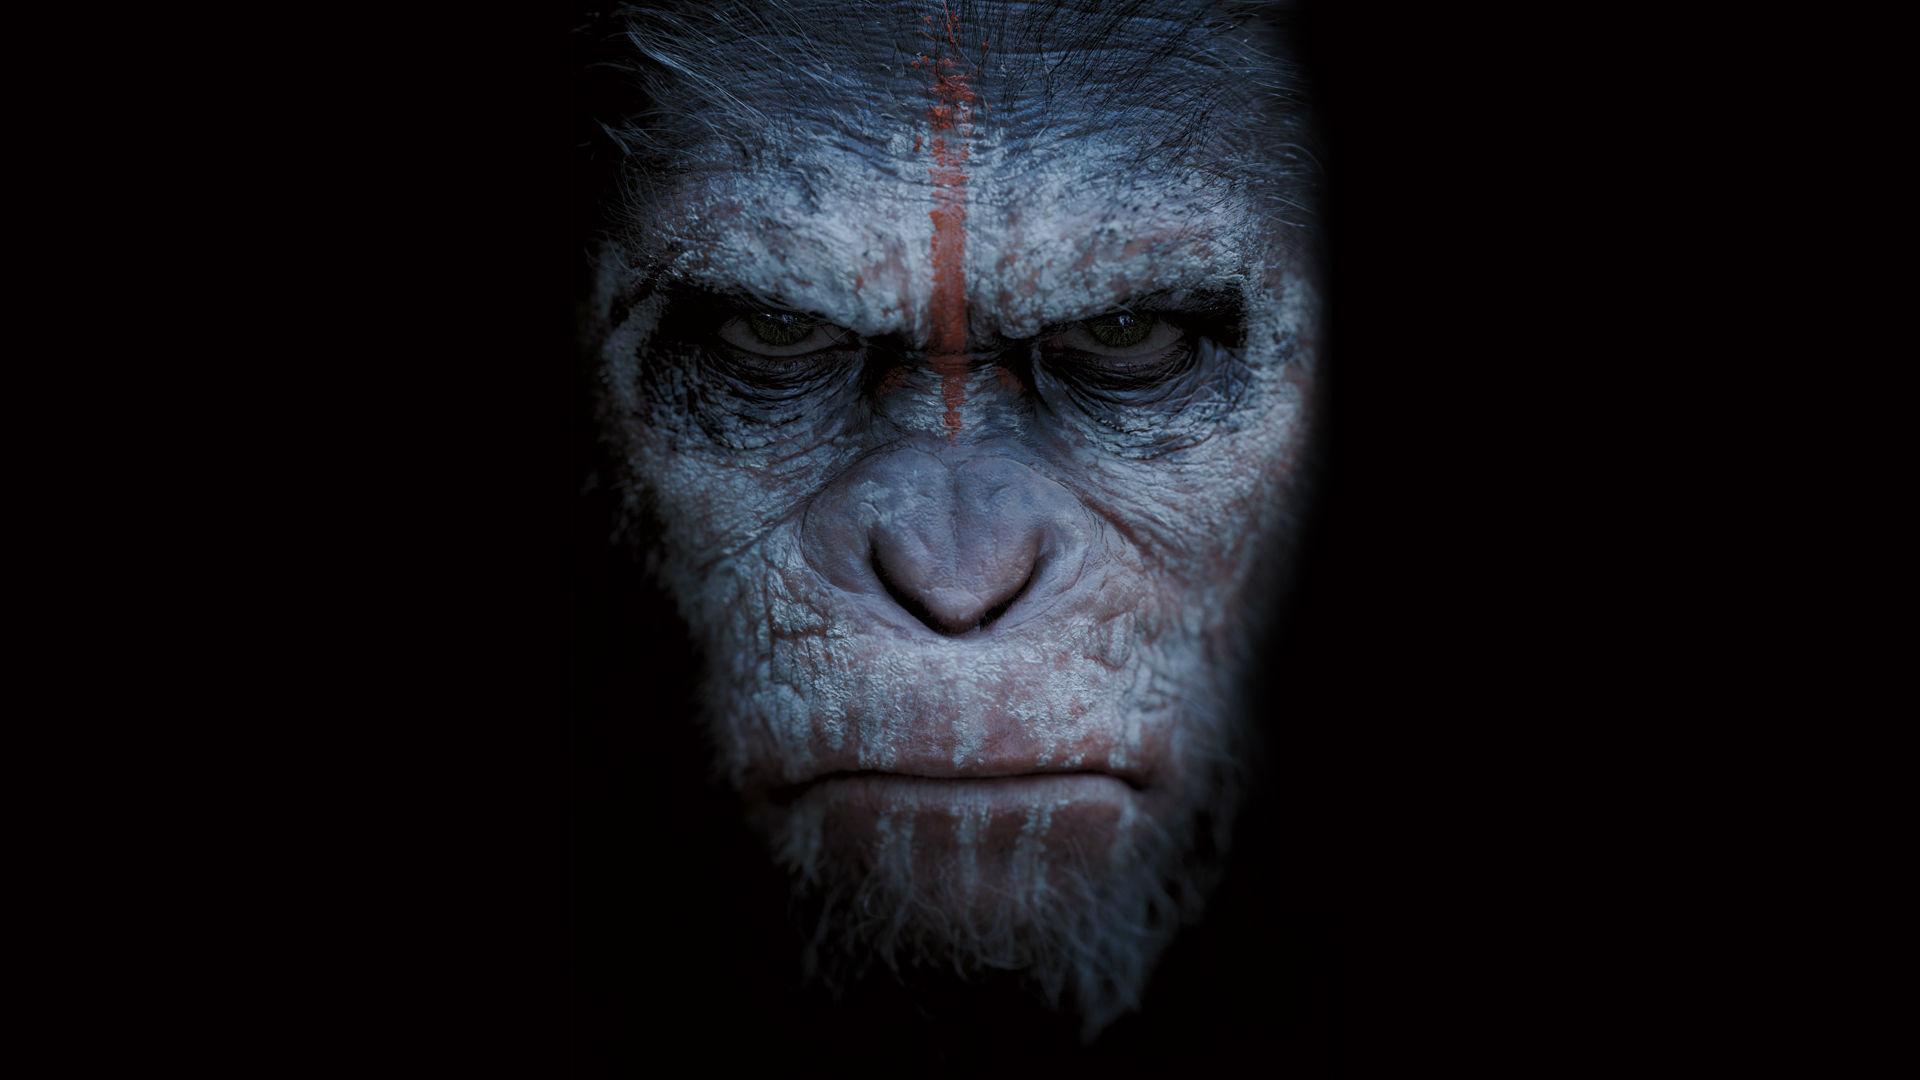 Bathing apes 6994760 1920x1080